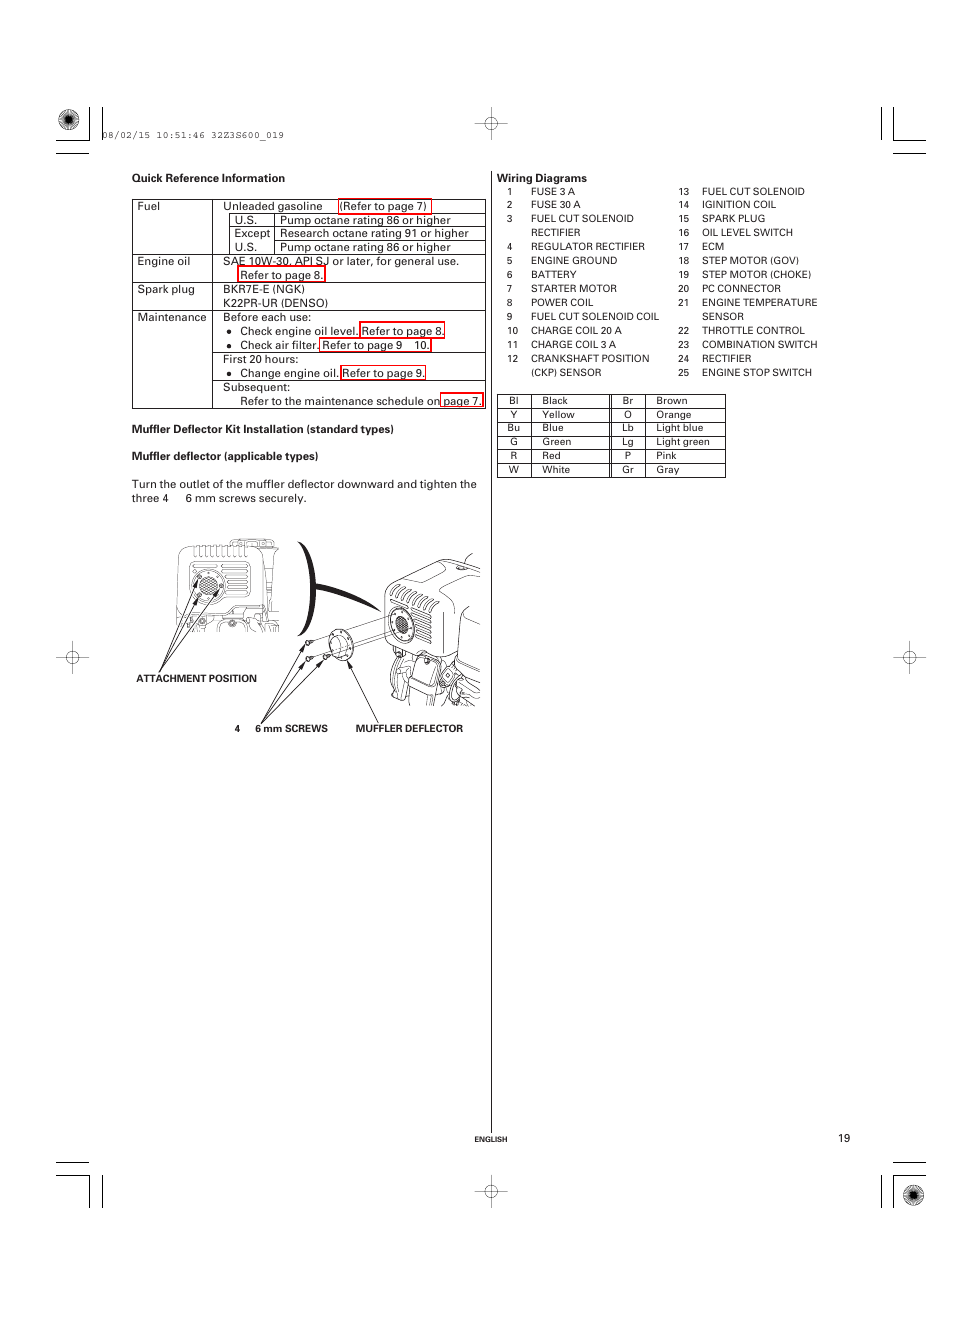 Quick Reference Information Muffler Deflector Kit Installation Stepper Motor Wiring Basics Diagrams Honda Igx440 User Manual